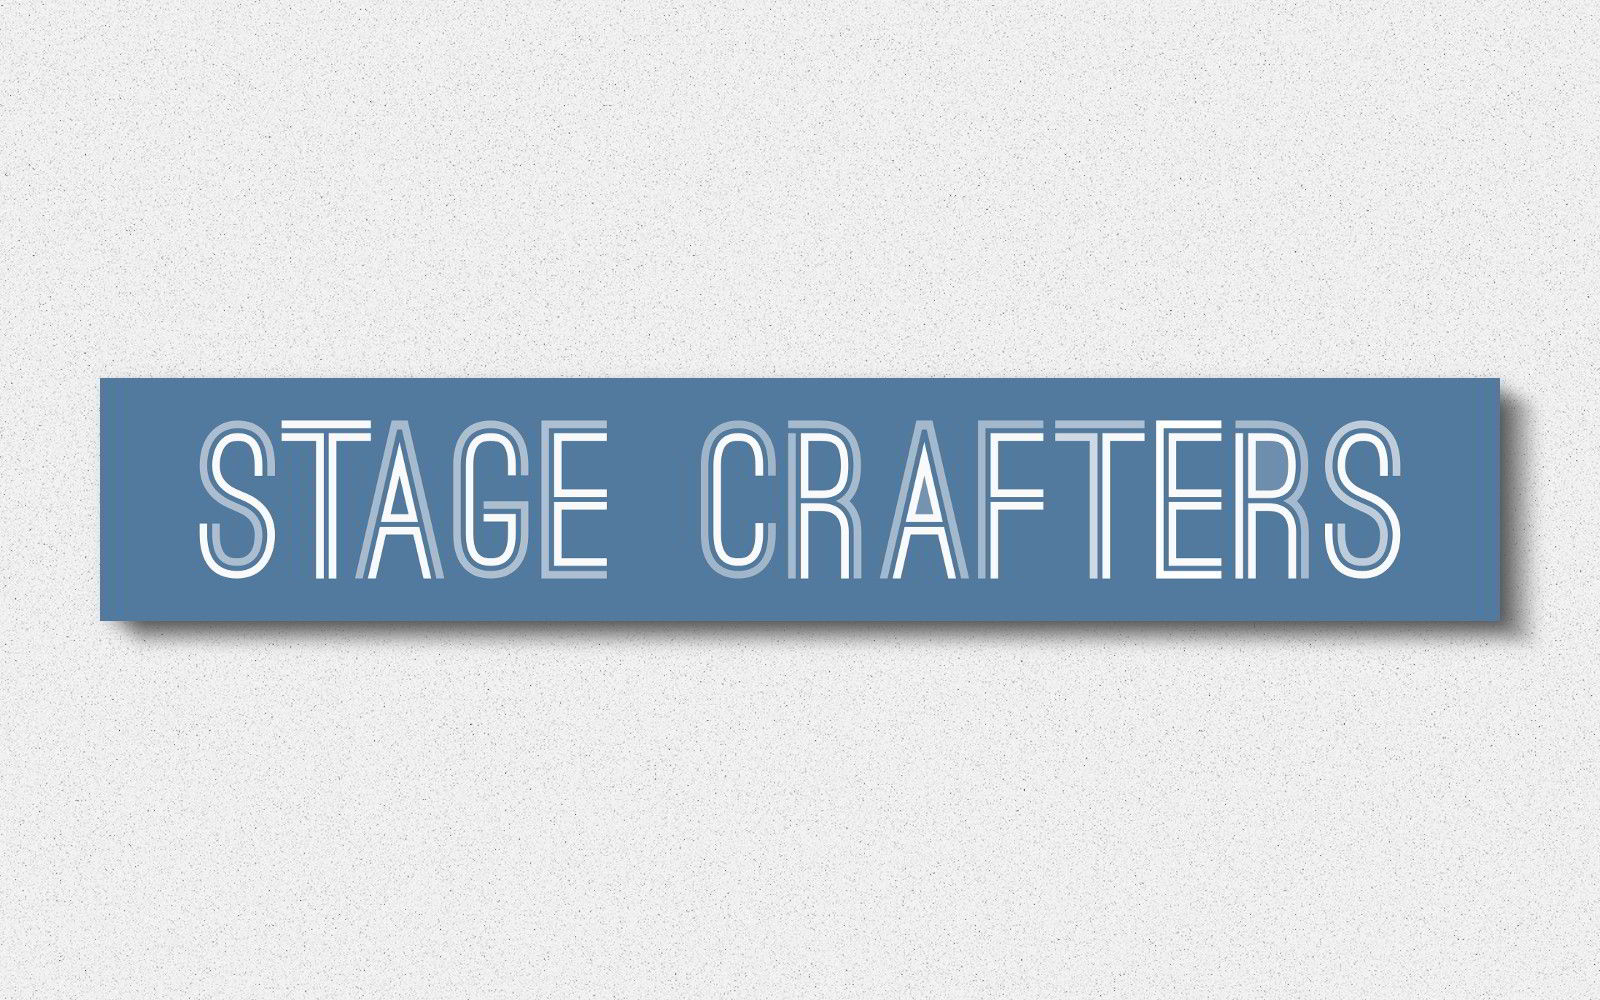 stagecrafters-memory-slash-vision-08